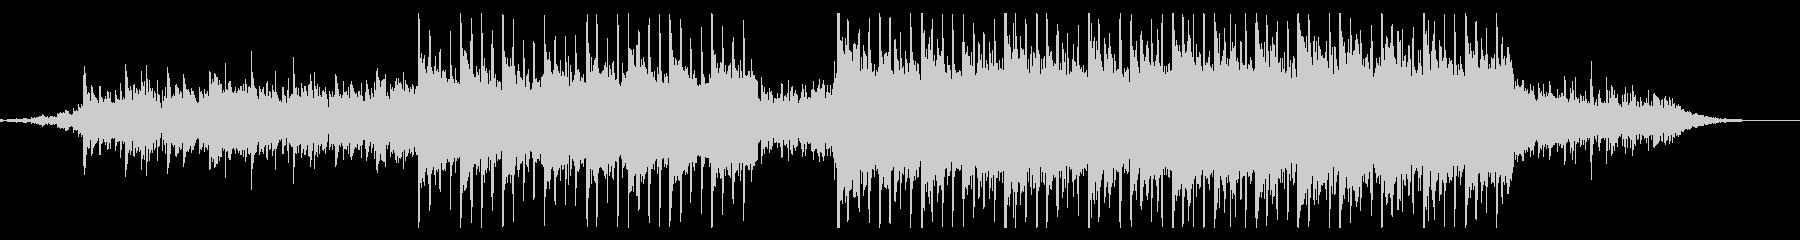 bgm44の未再生の波形